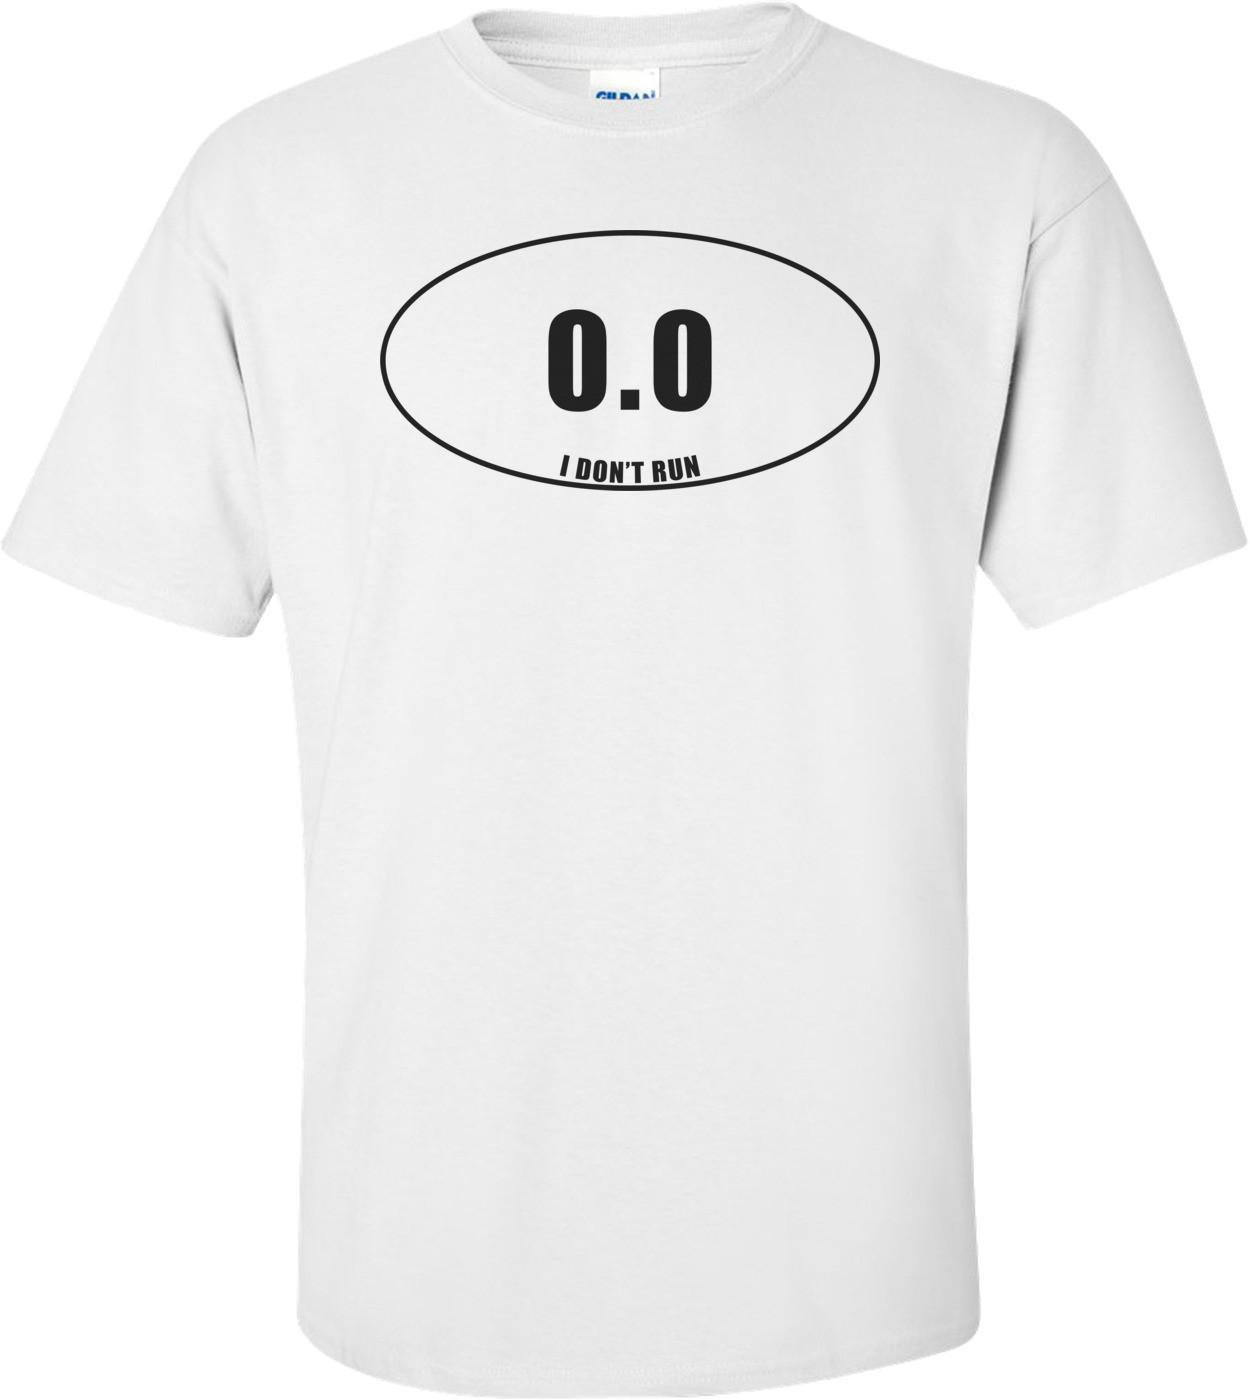 0.0 I Don't Run Funny Shirt